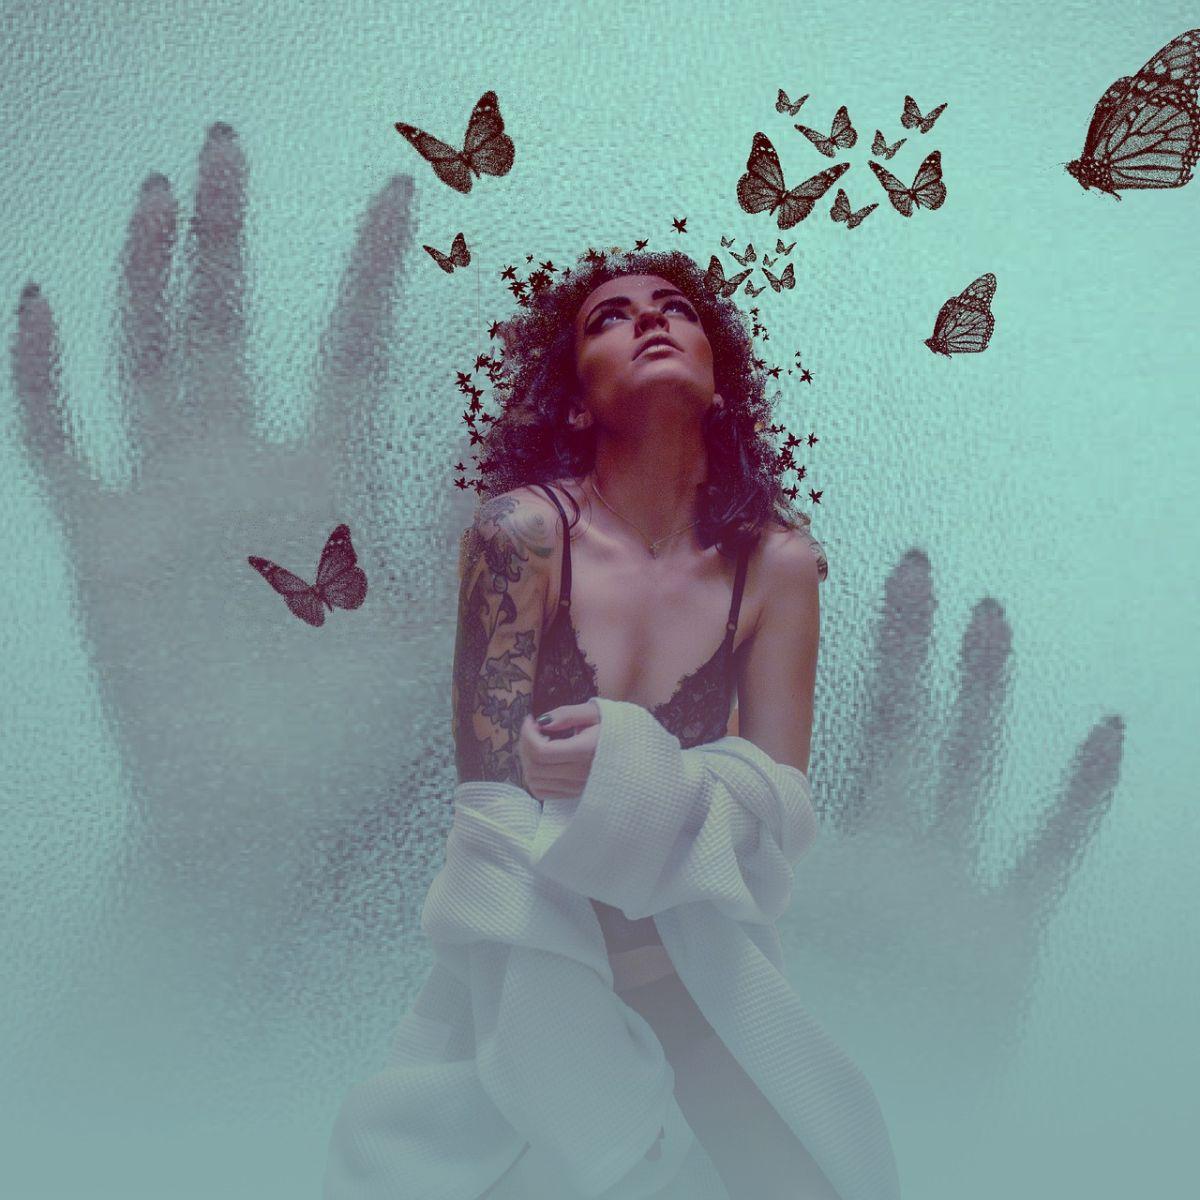 Woman, desire, longing, romance, romantic, butterflies, hands, dreamy